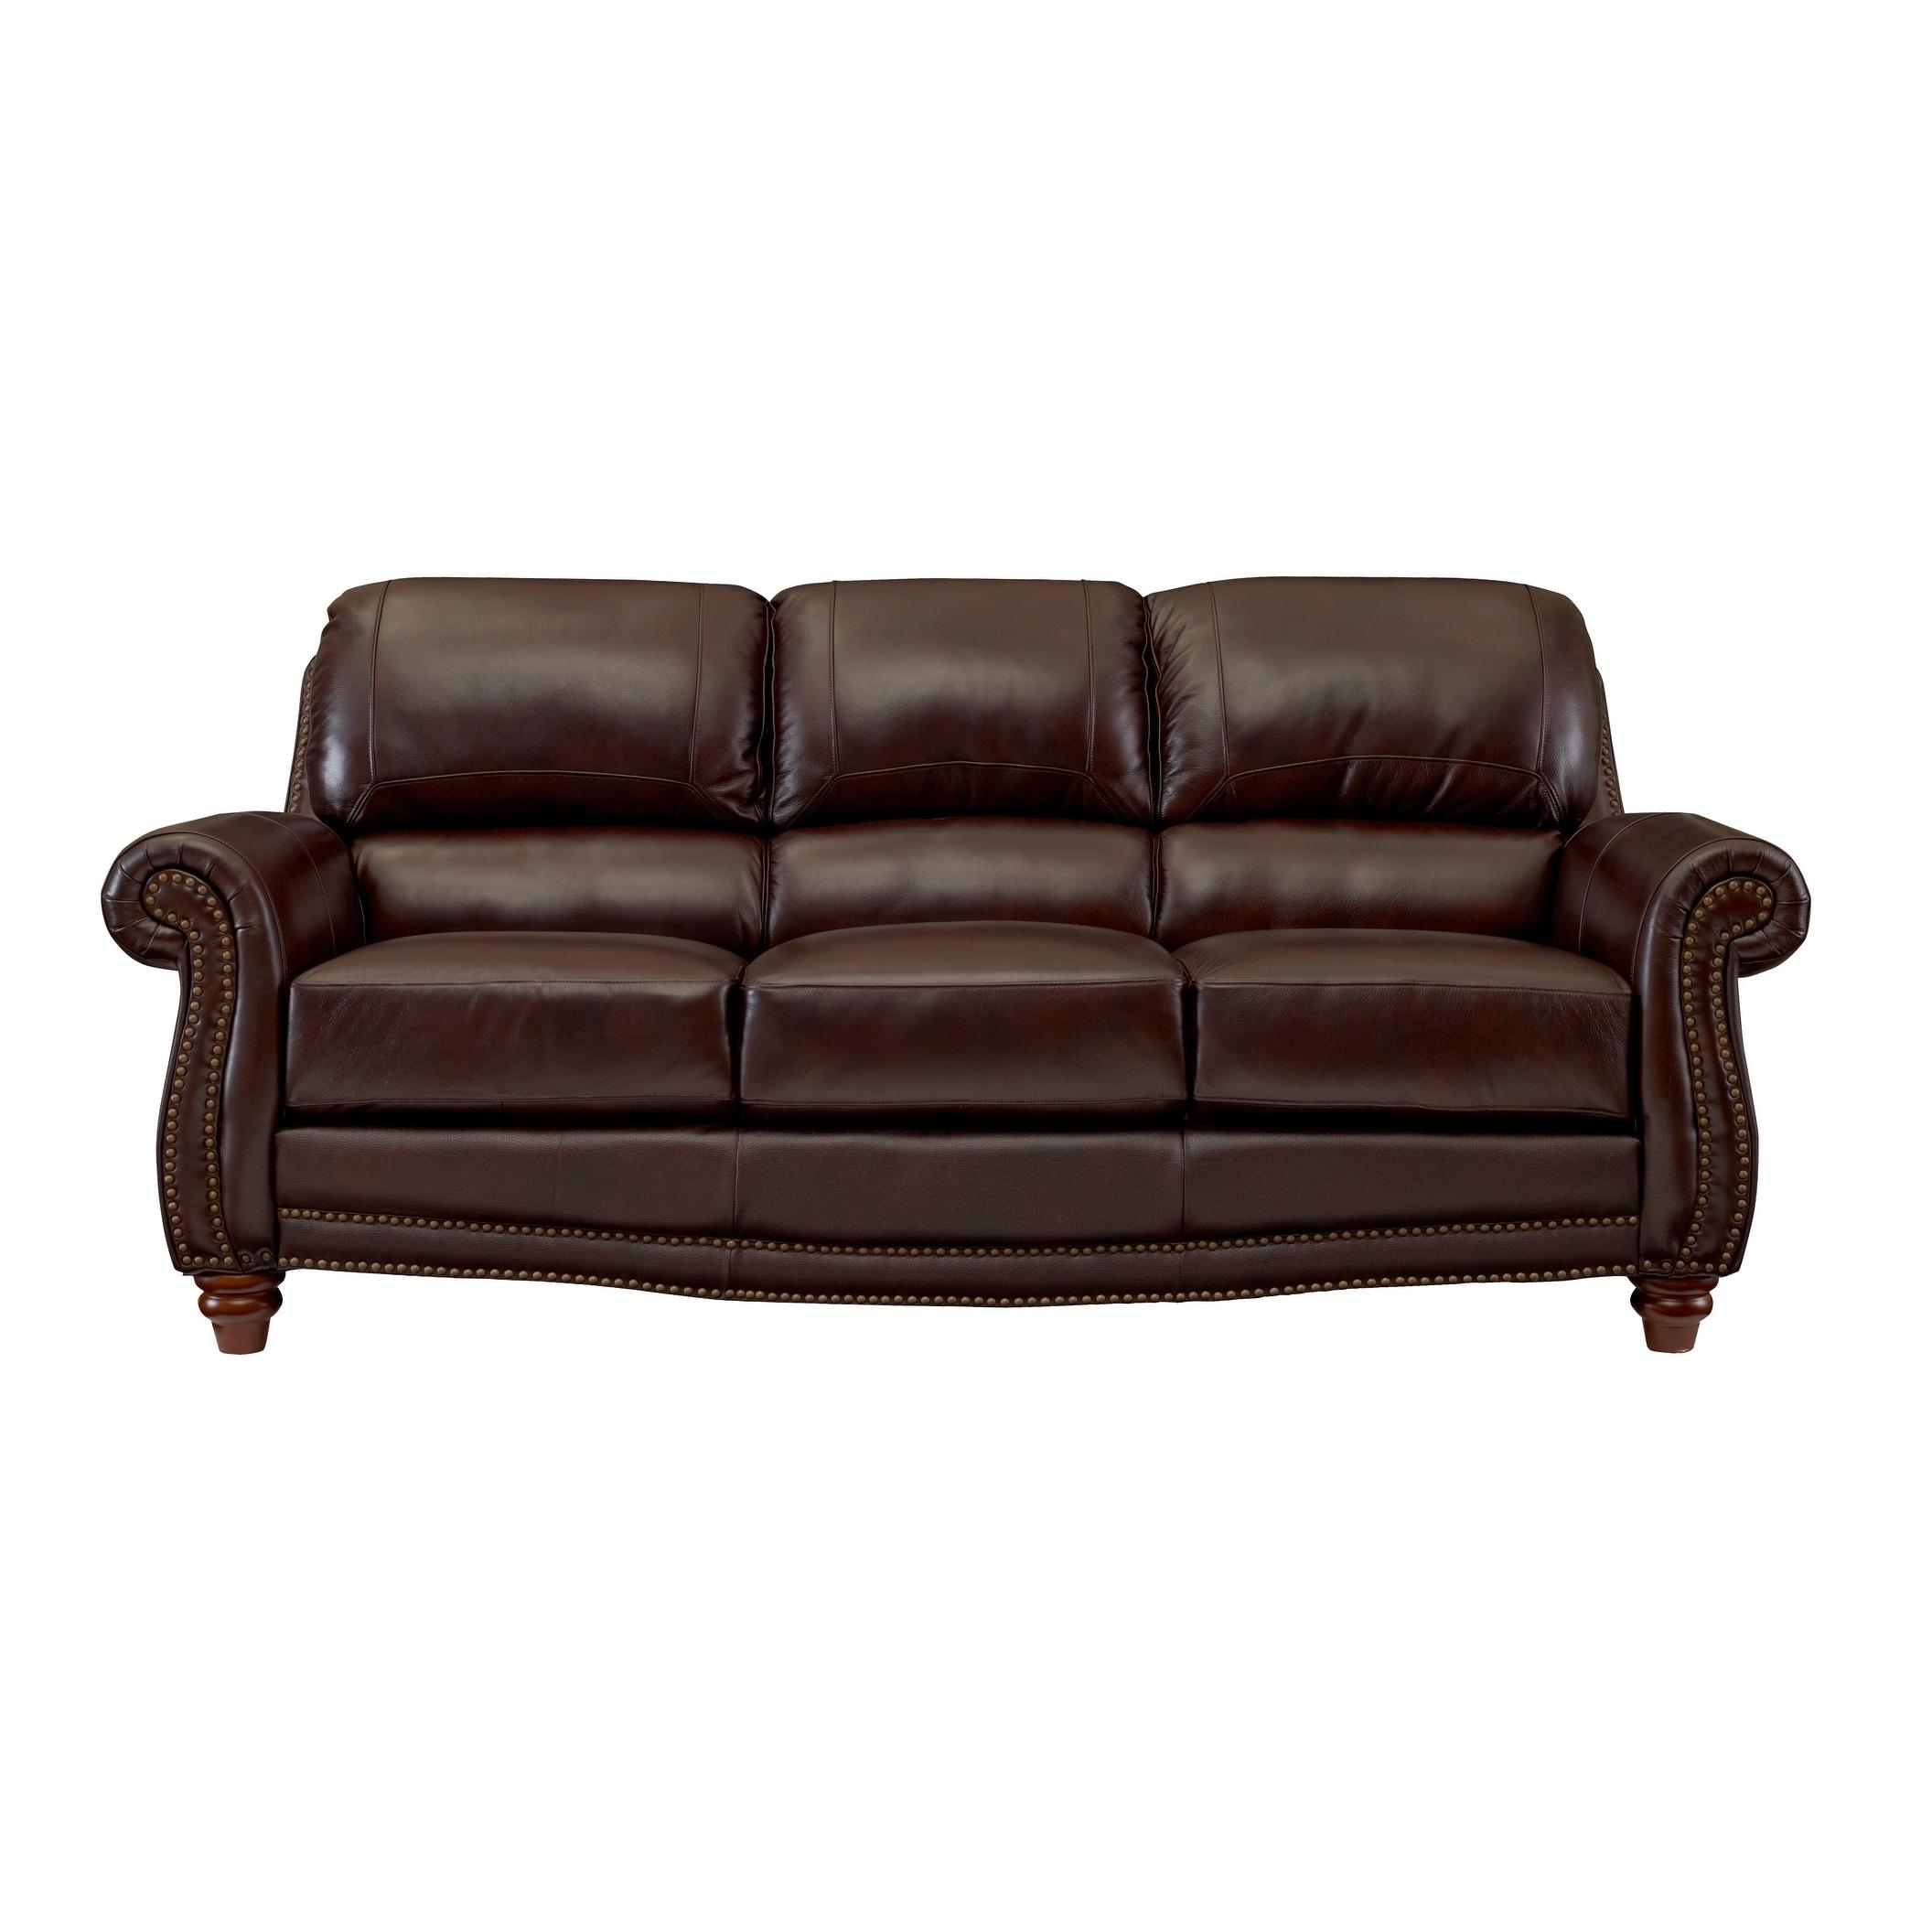 Shop Carter Top Grain Italian Leather Sofa   Free Shipping Today    Overstock.com   18008005